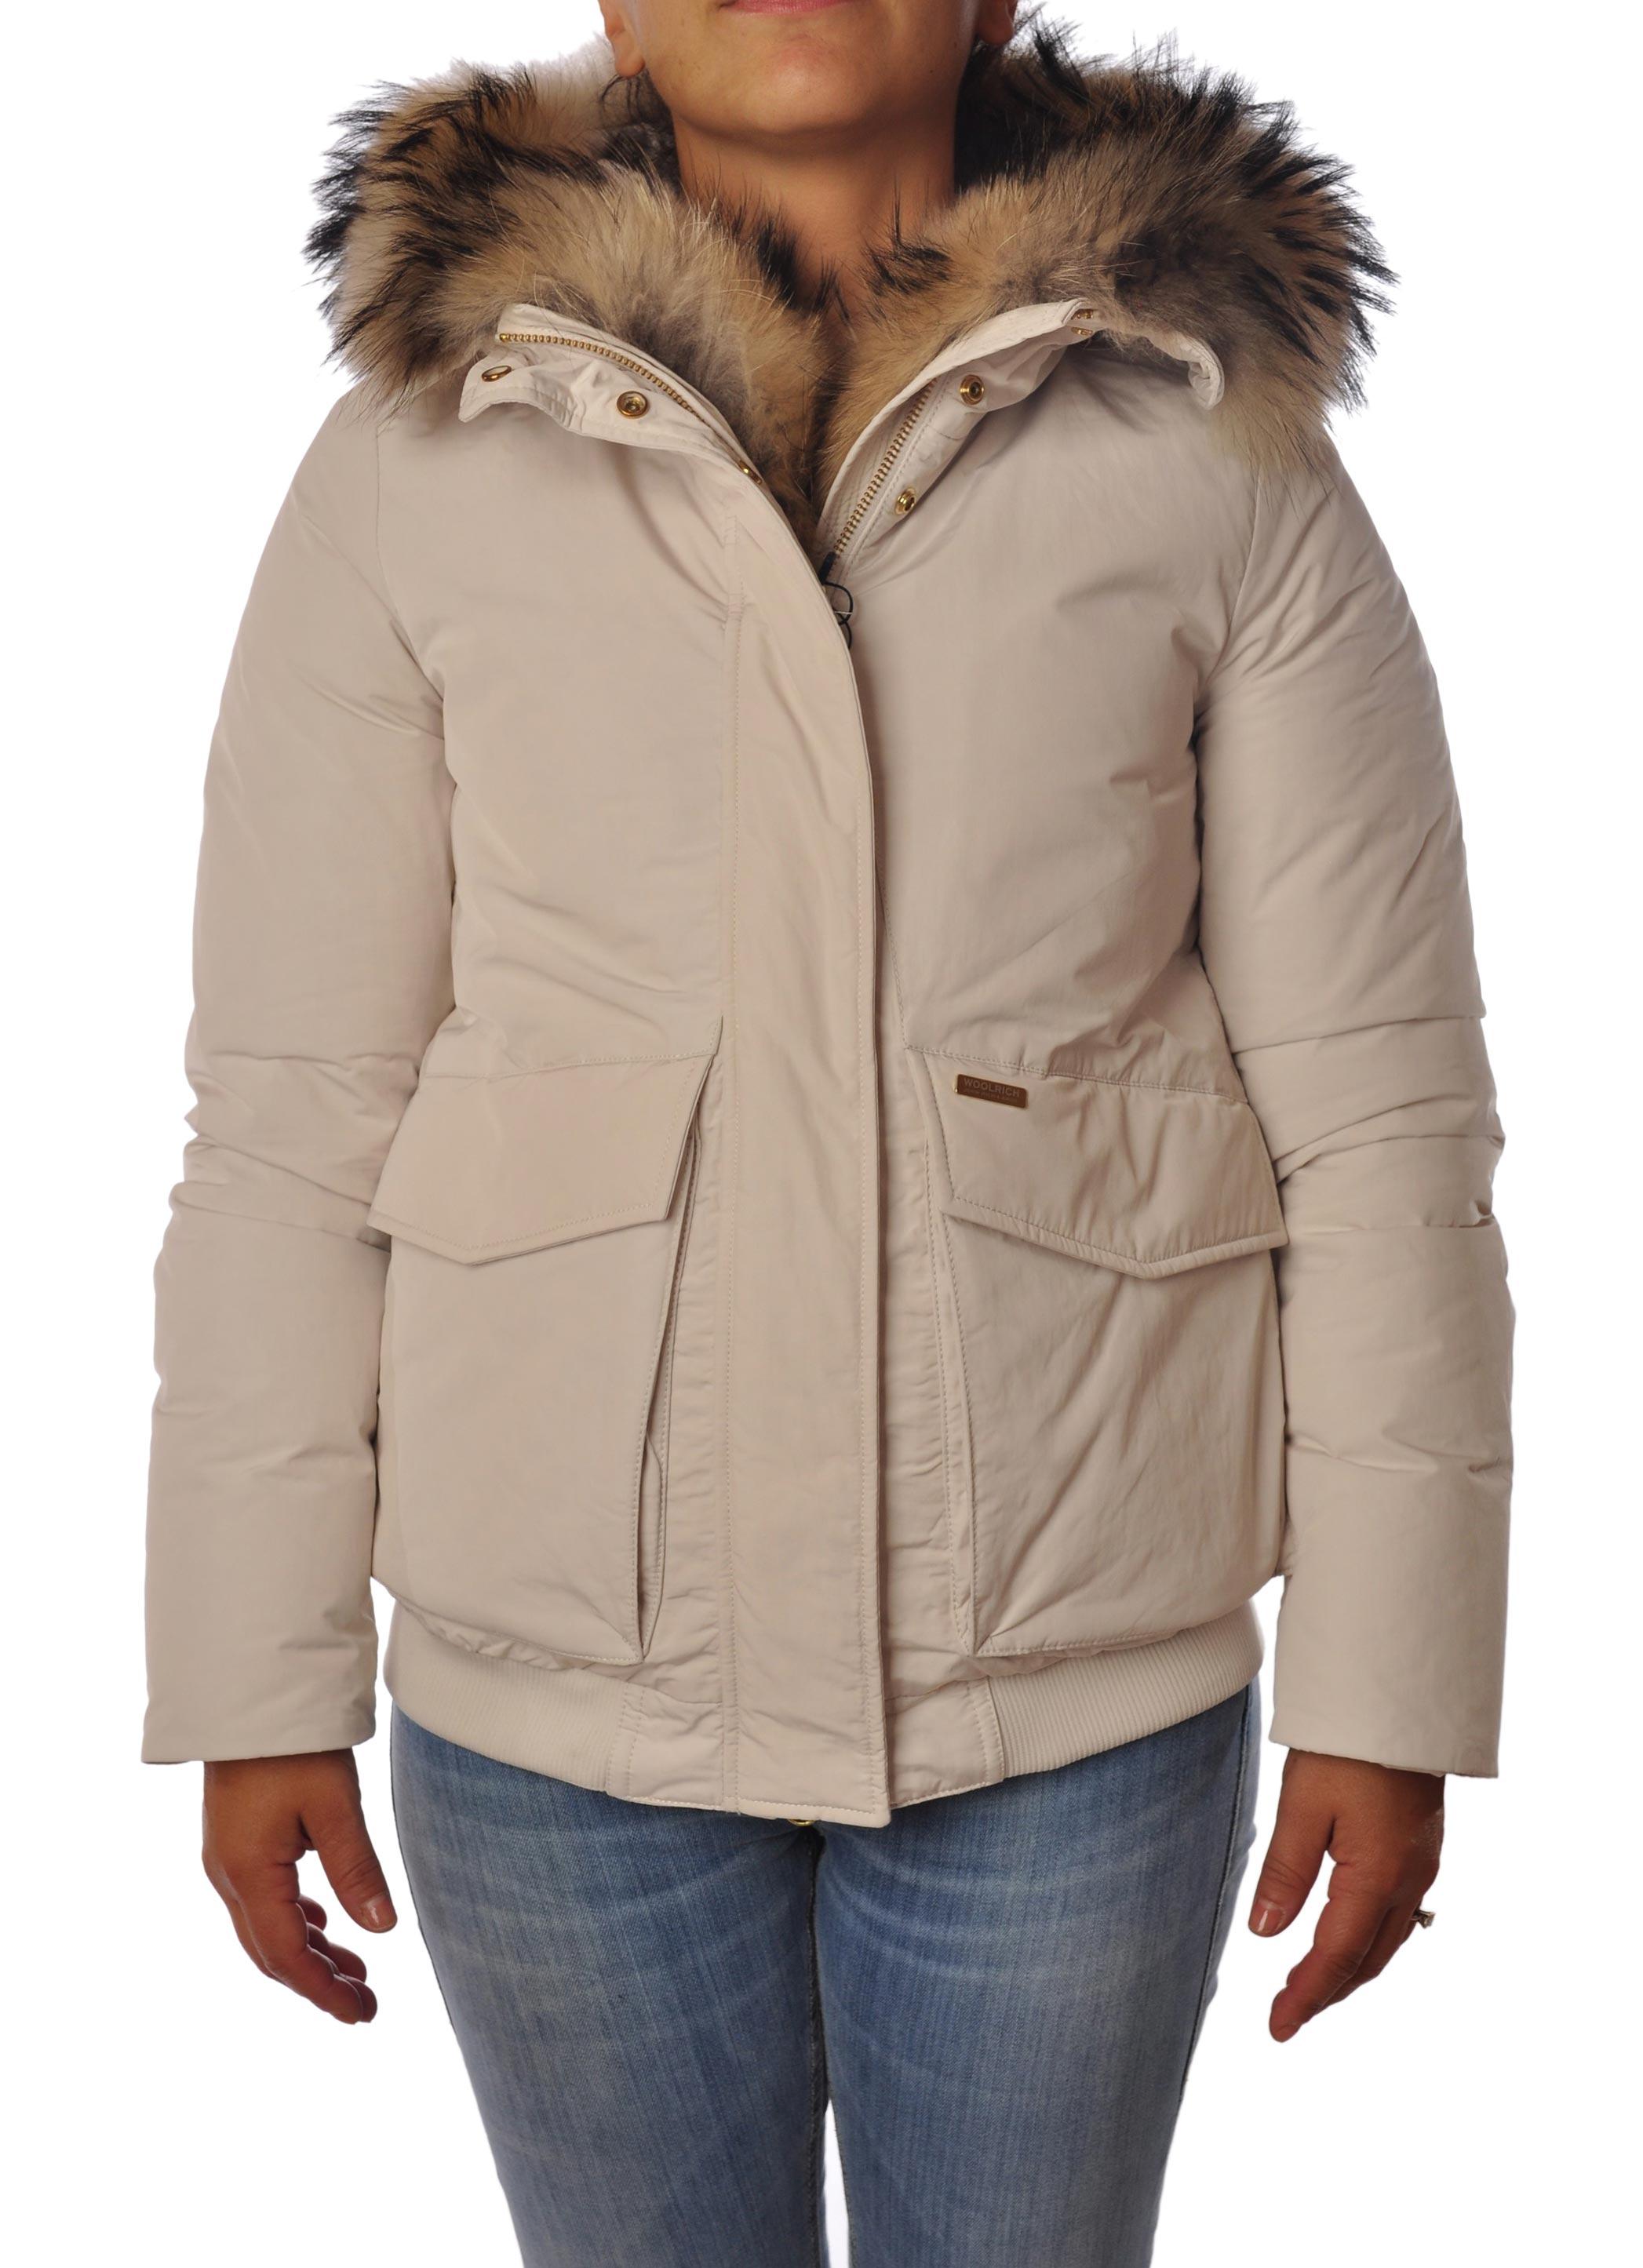 low priced b46e6 87325 Woolrich - Piumini   BresciShop -